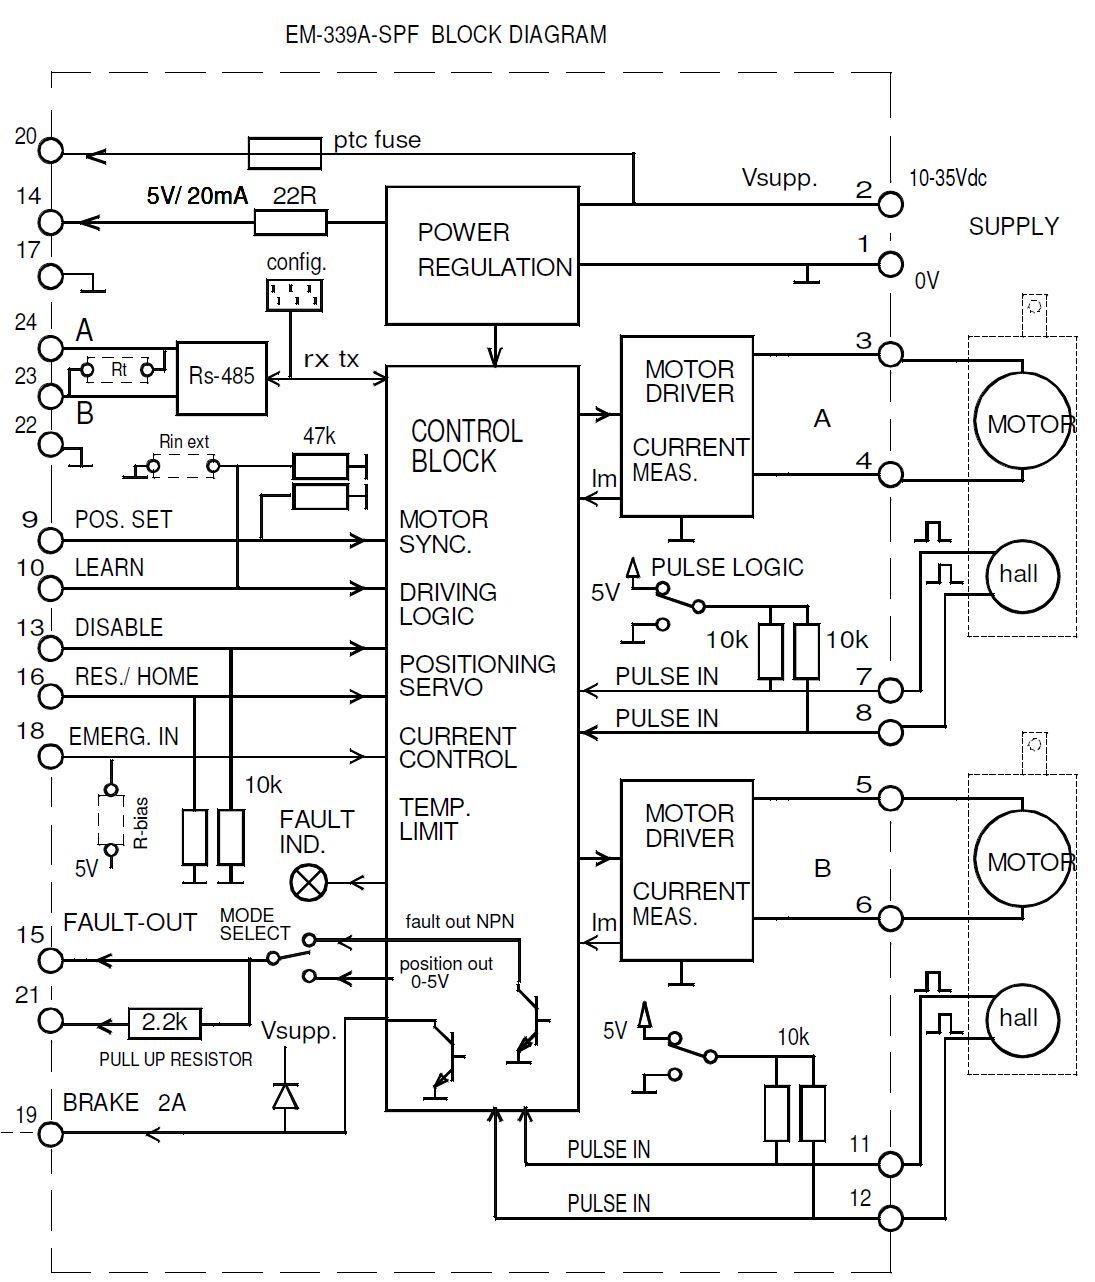 EM-339A-SPF_block